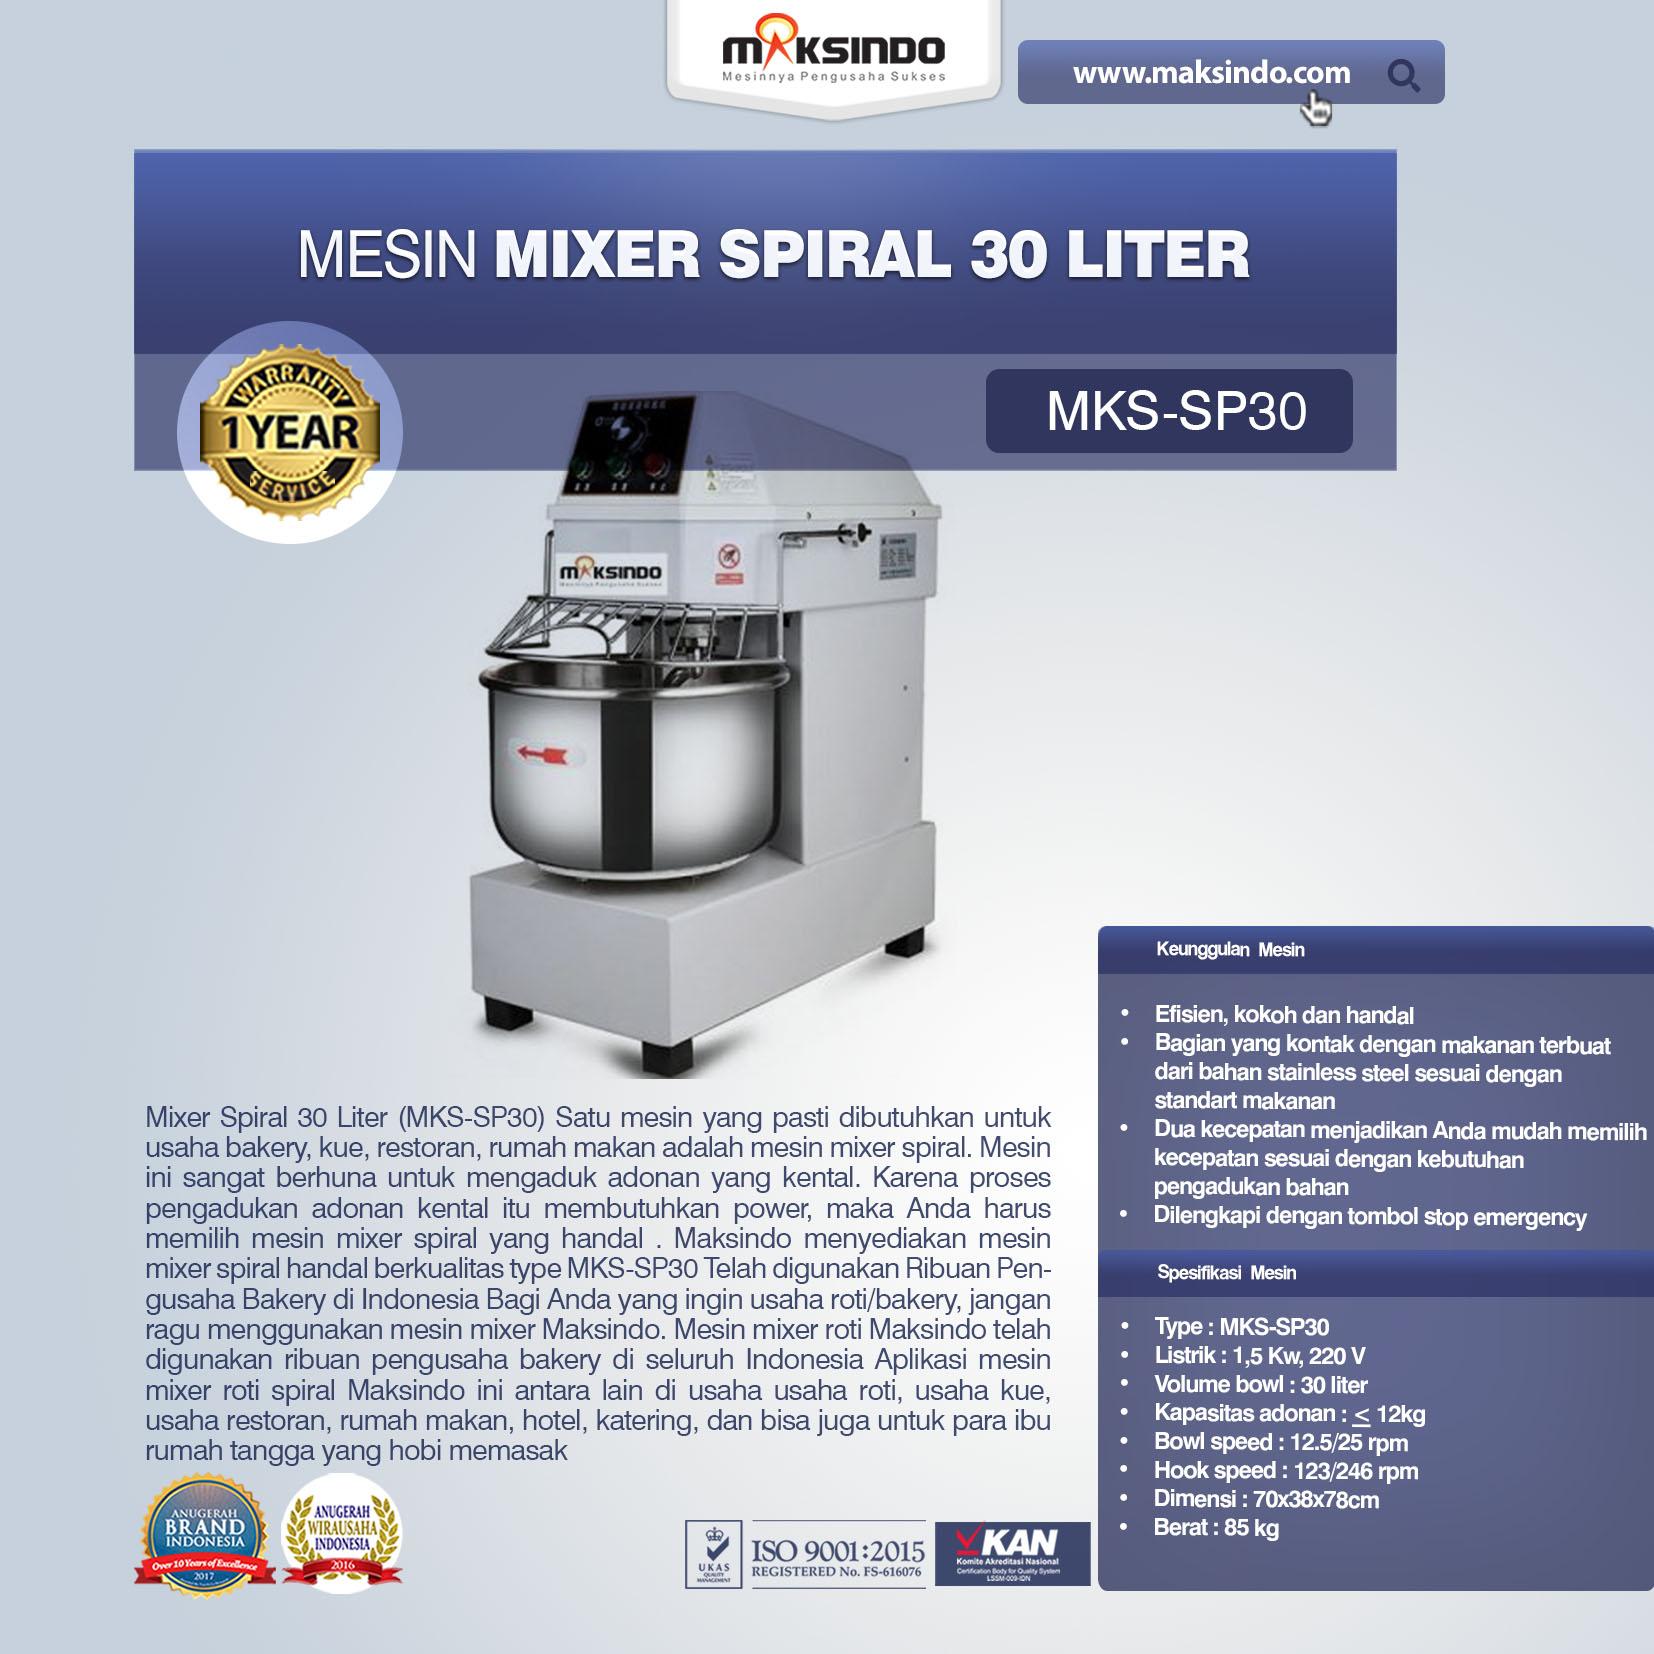 Jual Mixer Spiral 30 Liter (MKS-SP30) di Mataram